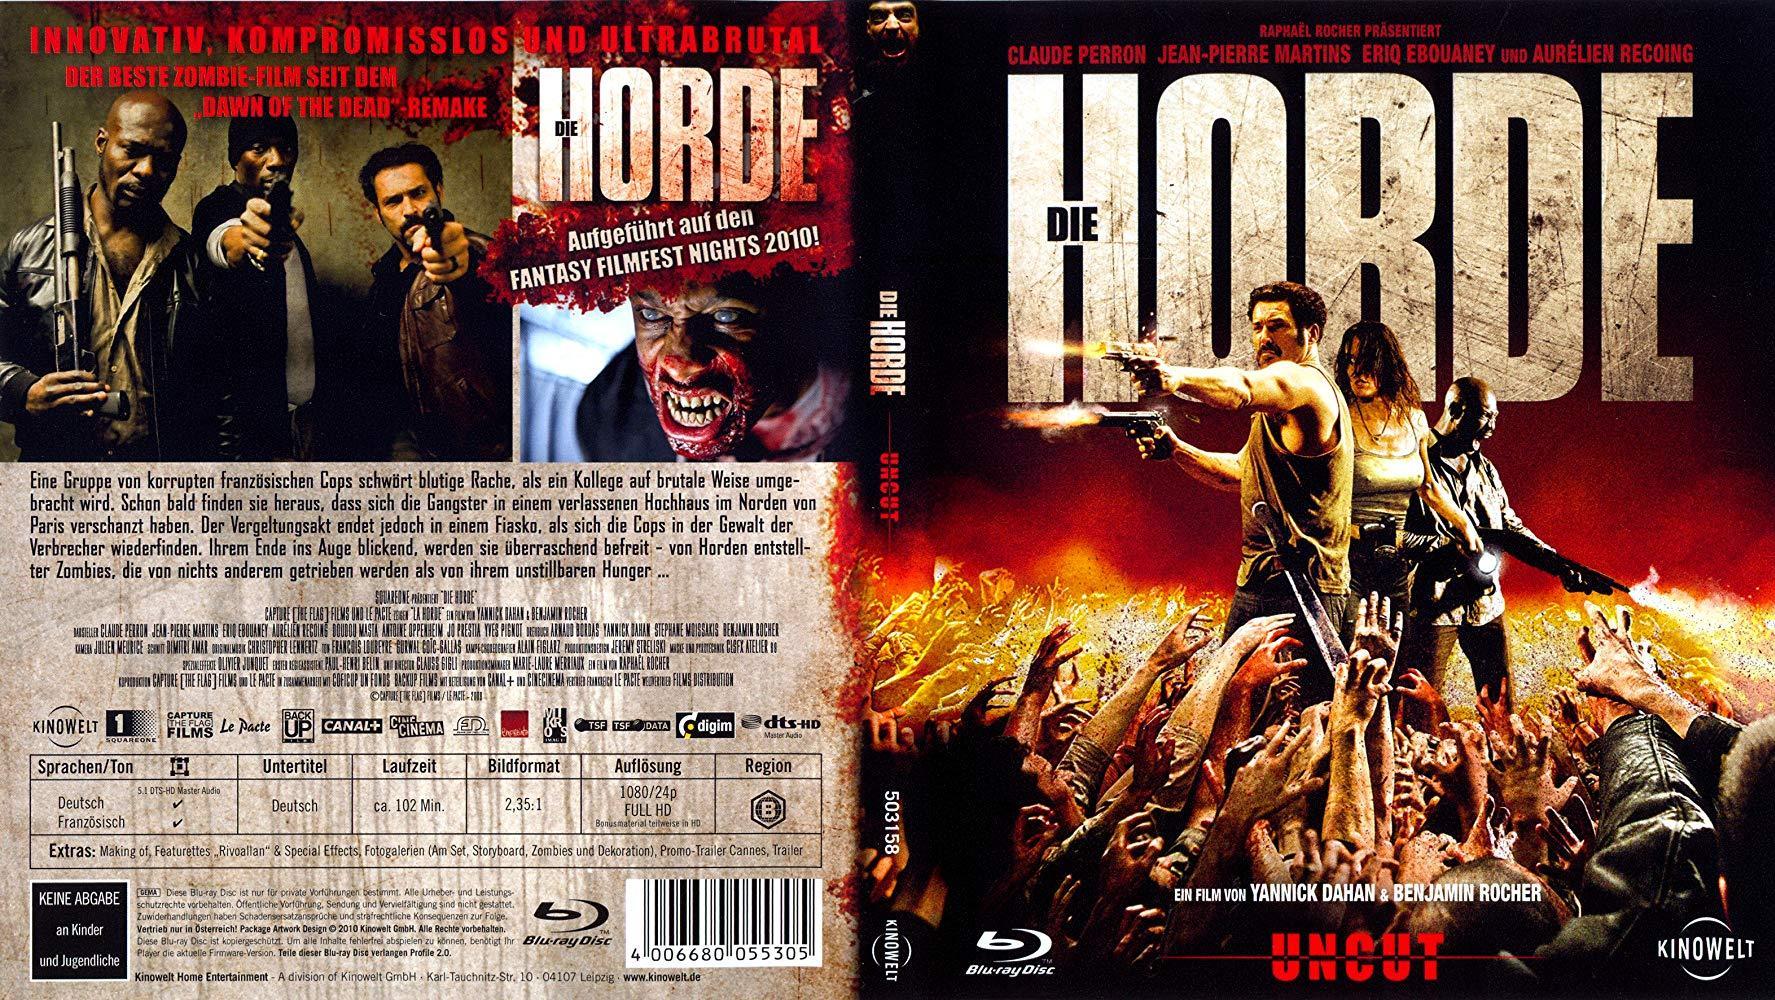 مشاهدة فيلم The Horde 2009 HD مترجم كامل اون لاين